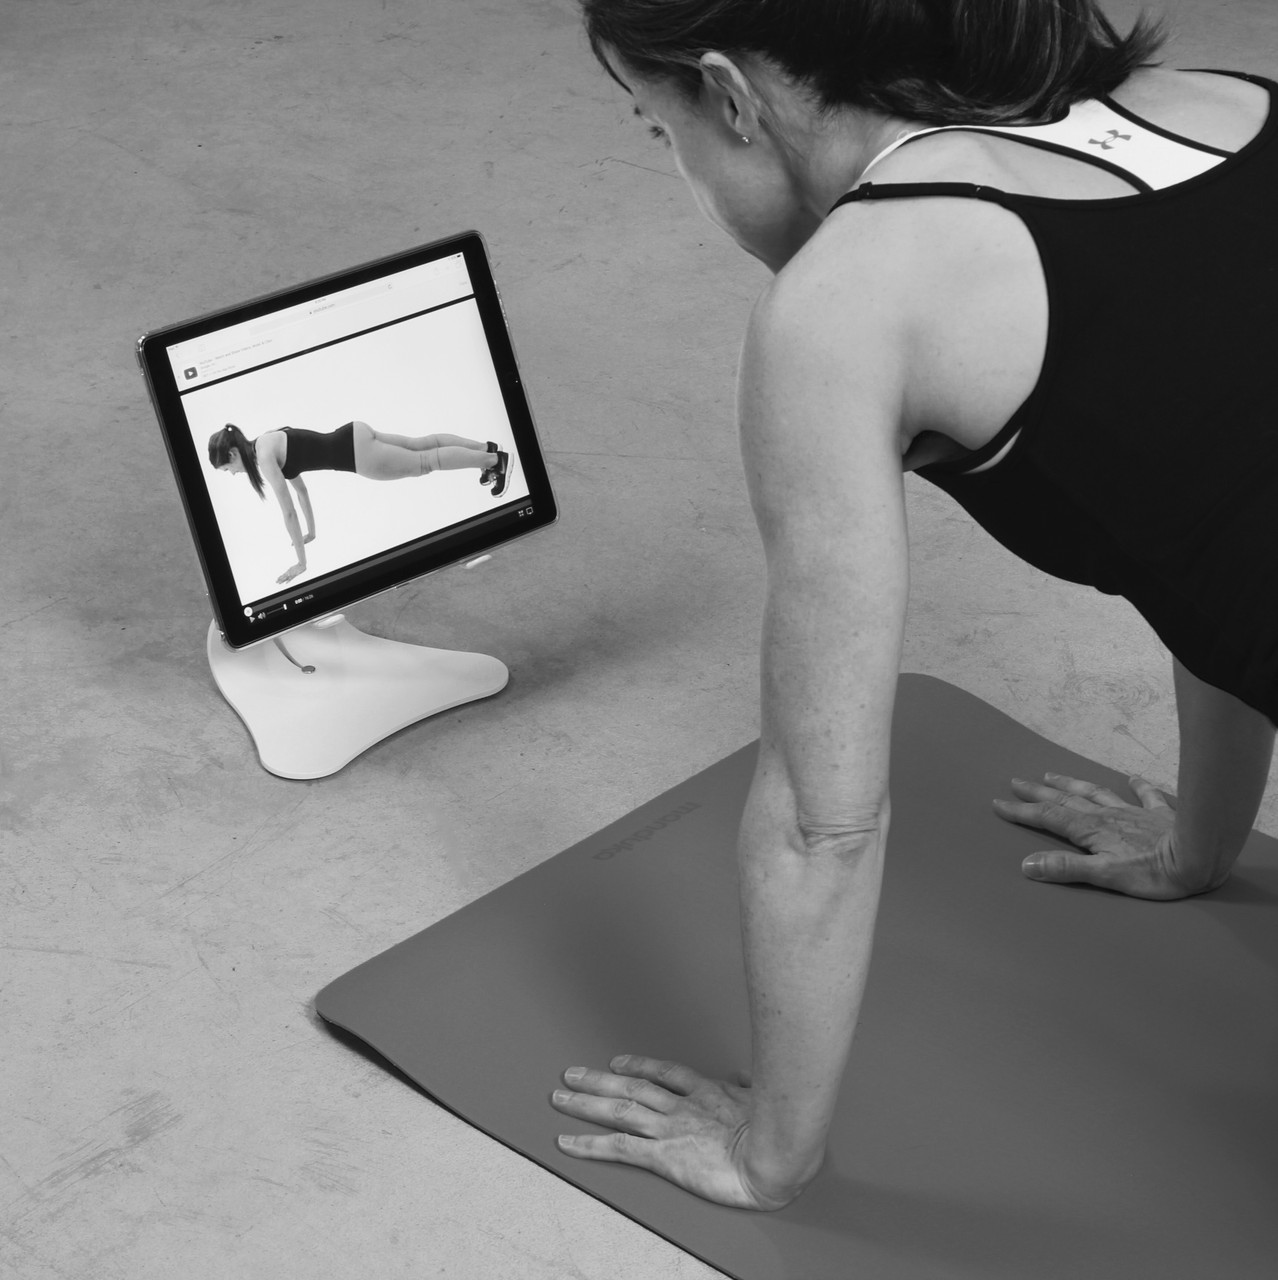 Professionals Love Simplex Tablet iPad Stand